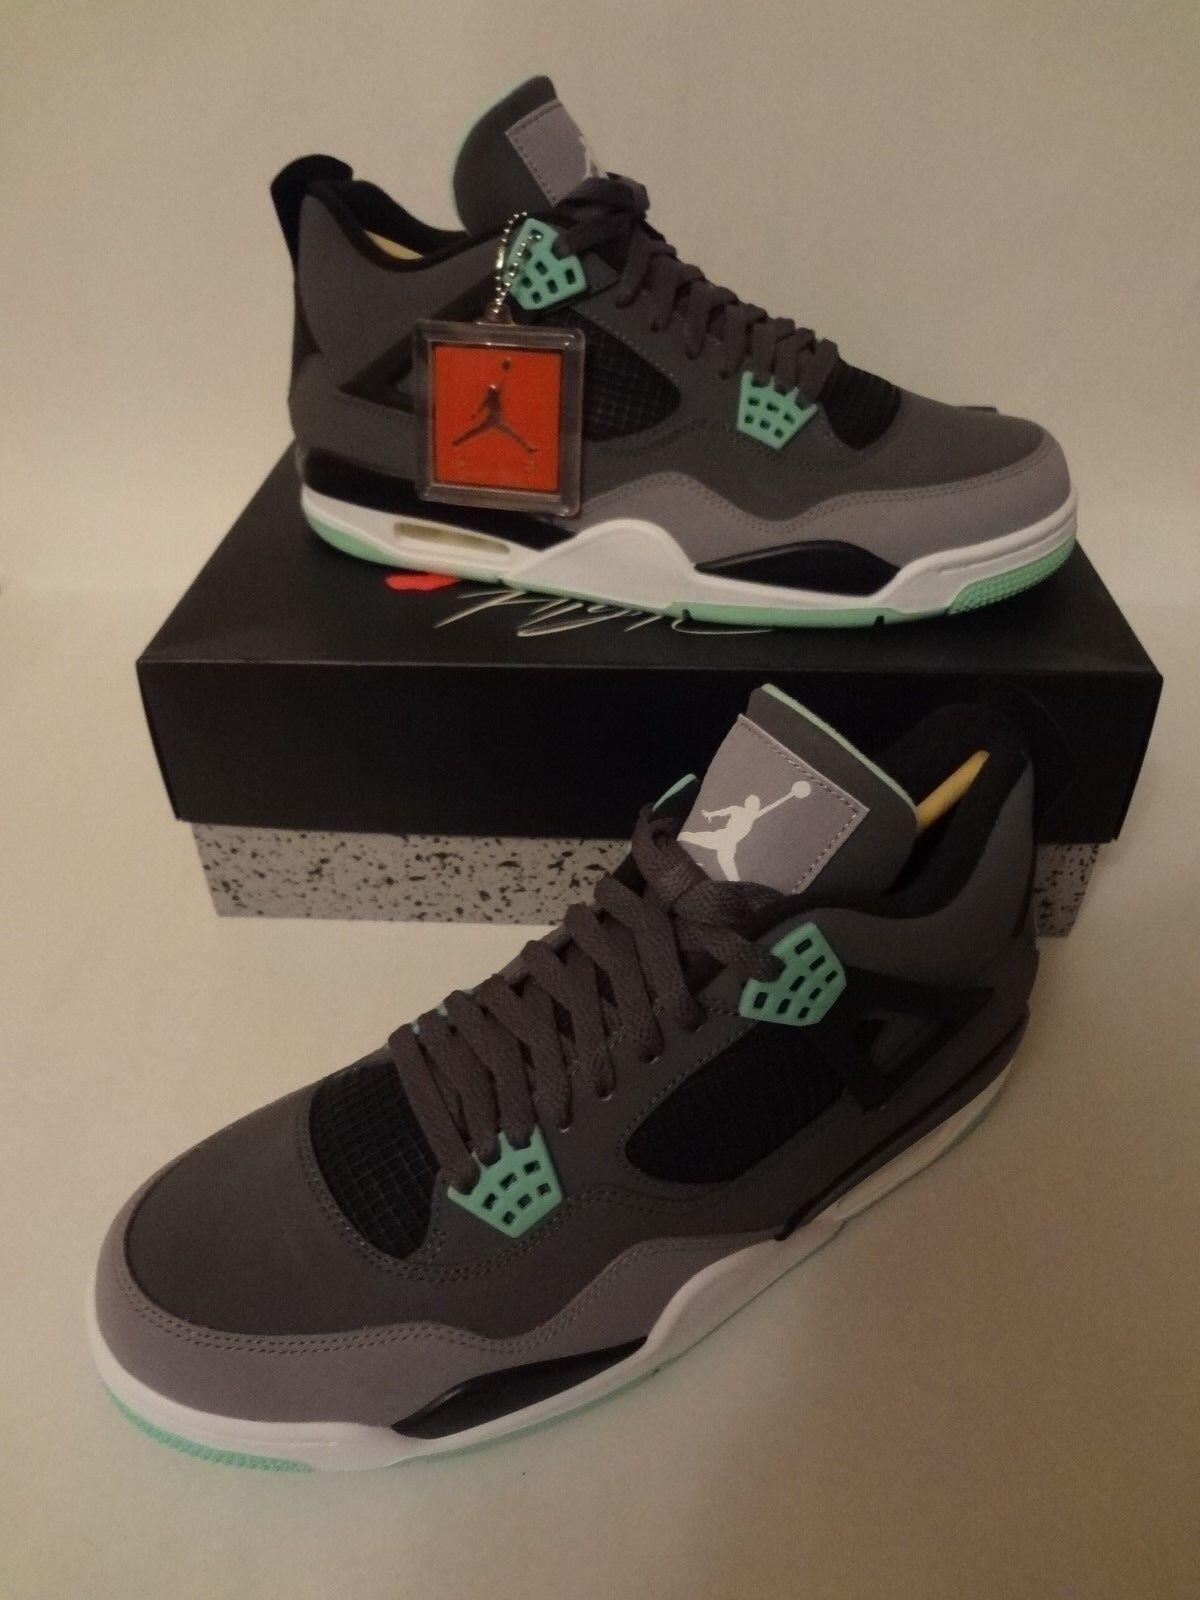 Nike Air Jordan IV 4 Retro GREEN GLOW Size 11.5 Dark Grey Cement 308497 033 NIB